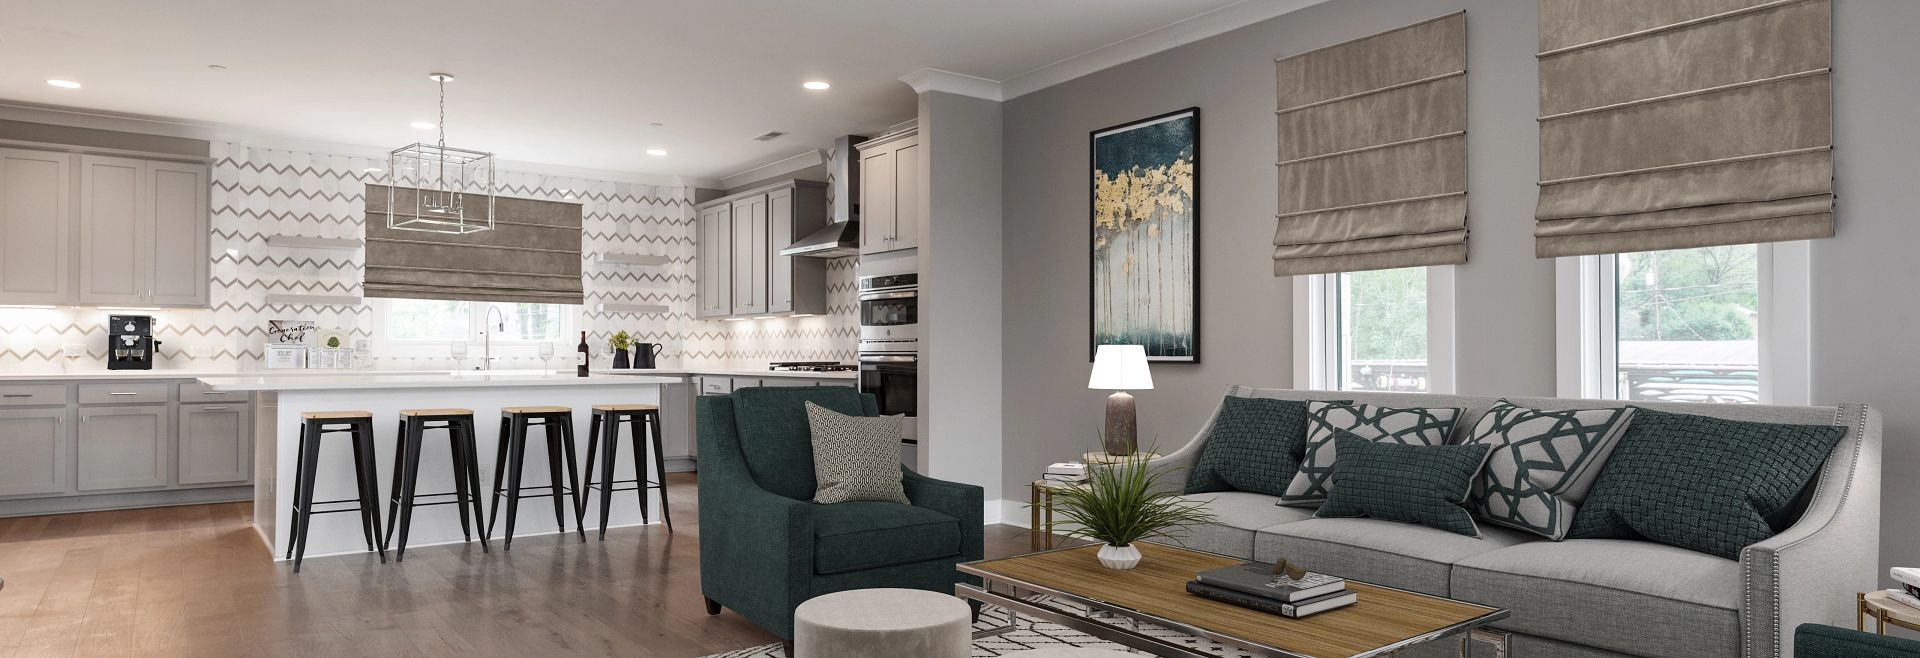 Tribeca Kitchen & Great Room